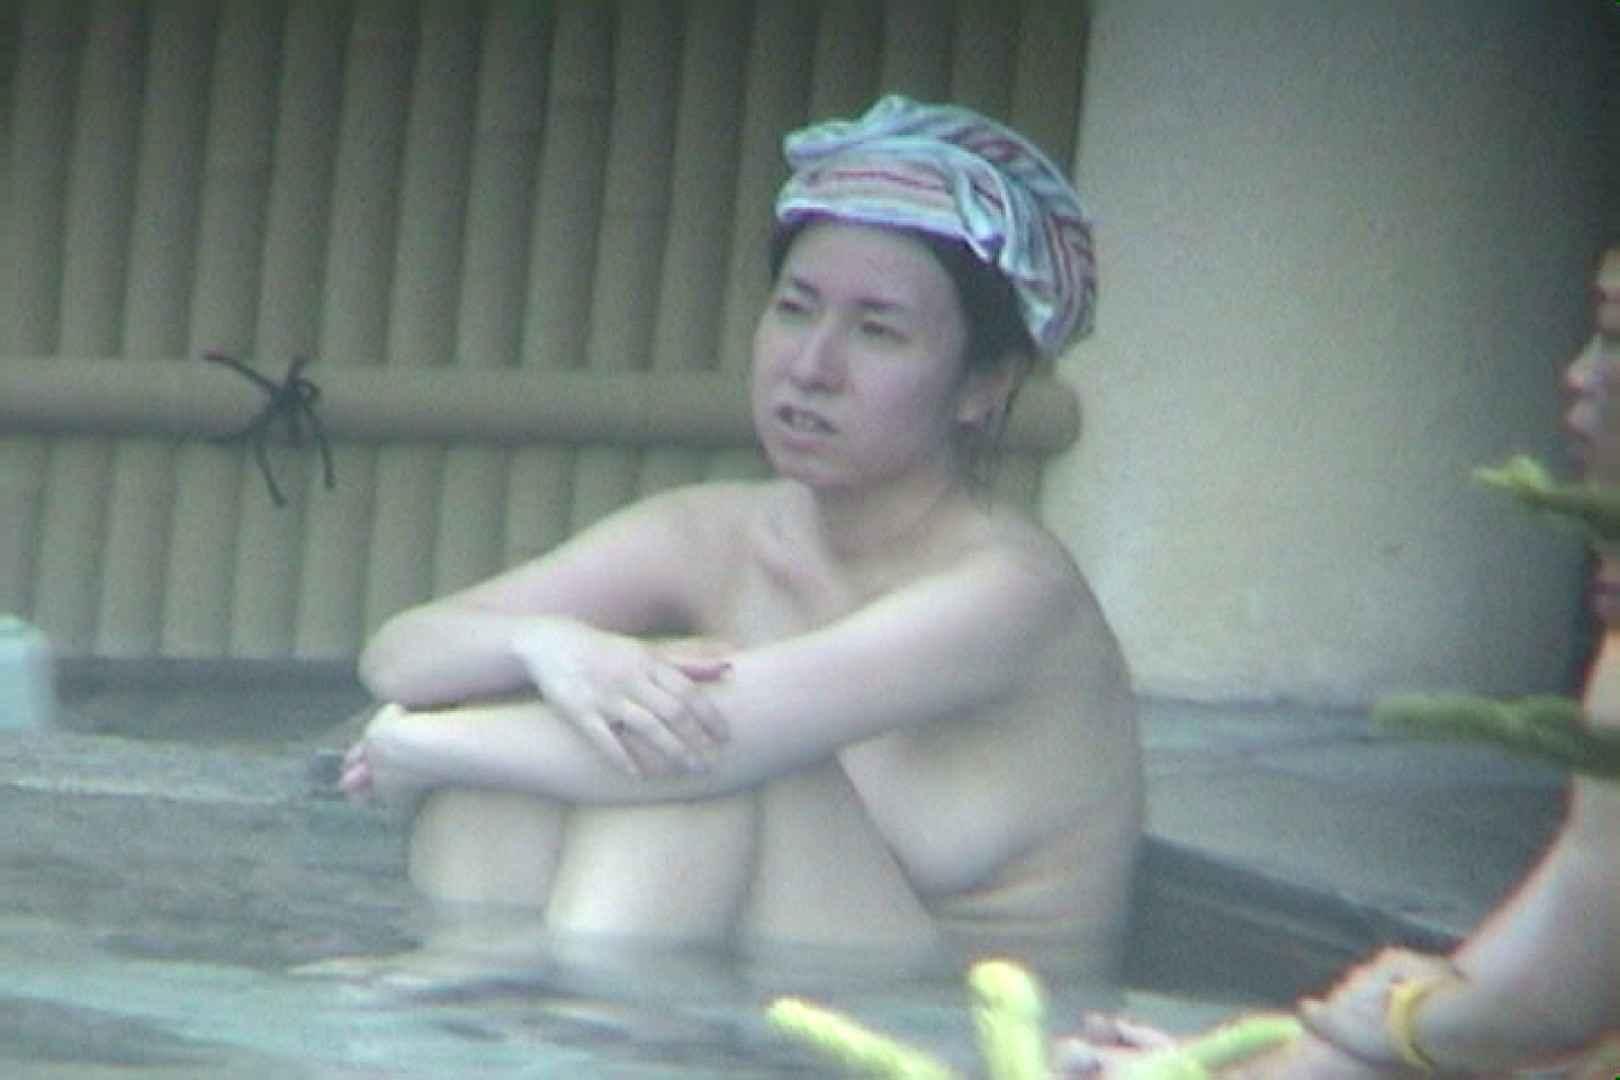 Aquaな露天風呂Vol.106 盗撮シリーズ | 露天風呂編  86PIX 33